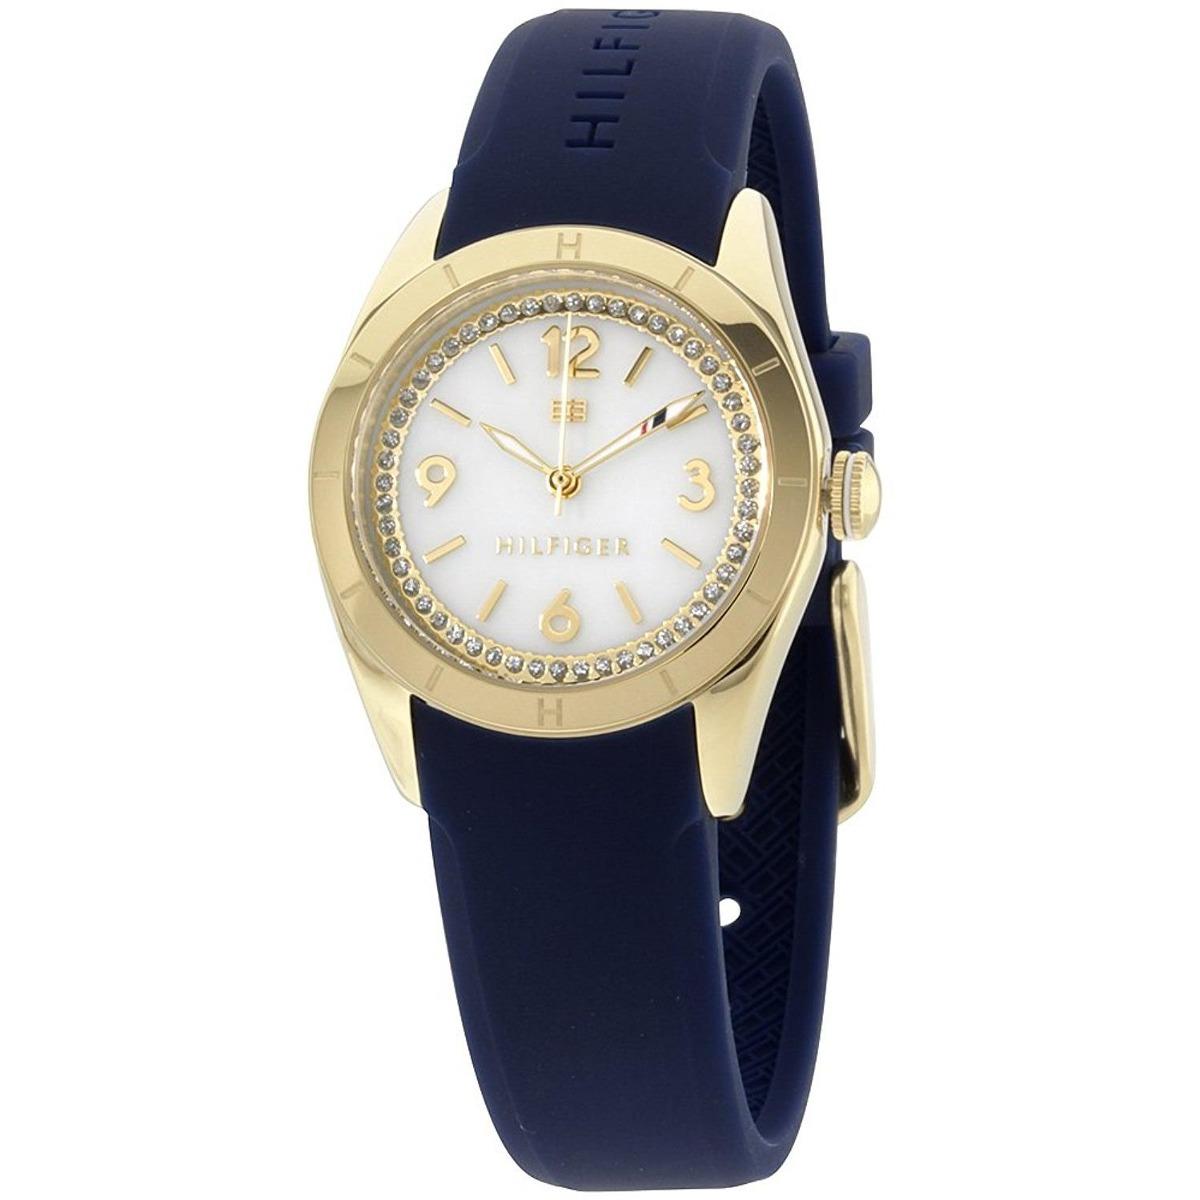 92d9a3b3b6ee Reloj Tommy Hilfiger Para Mujer 1781633 43mm Análogo -   336.550 en ...